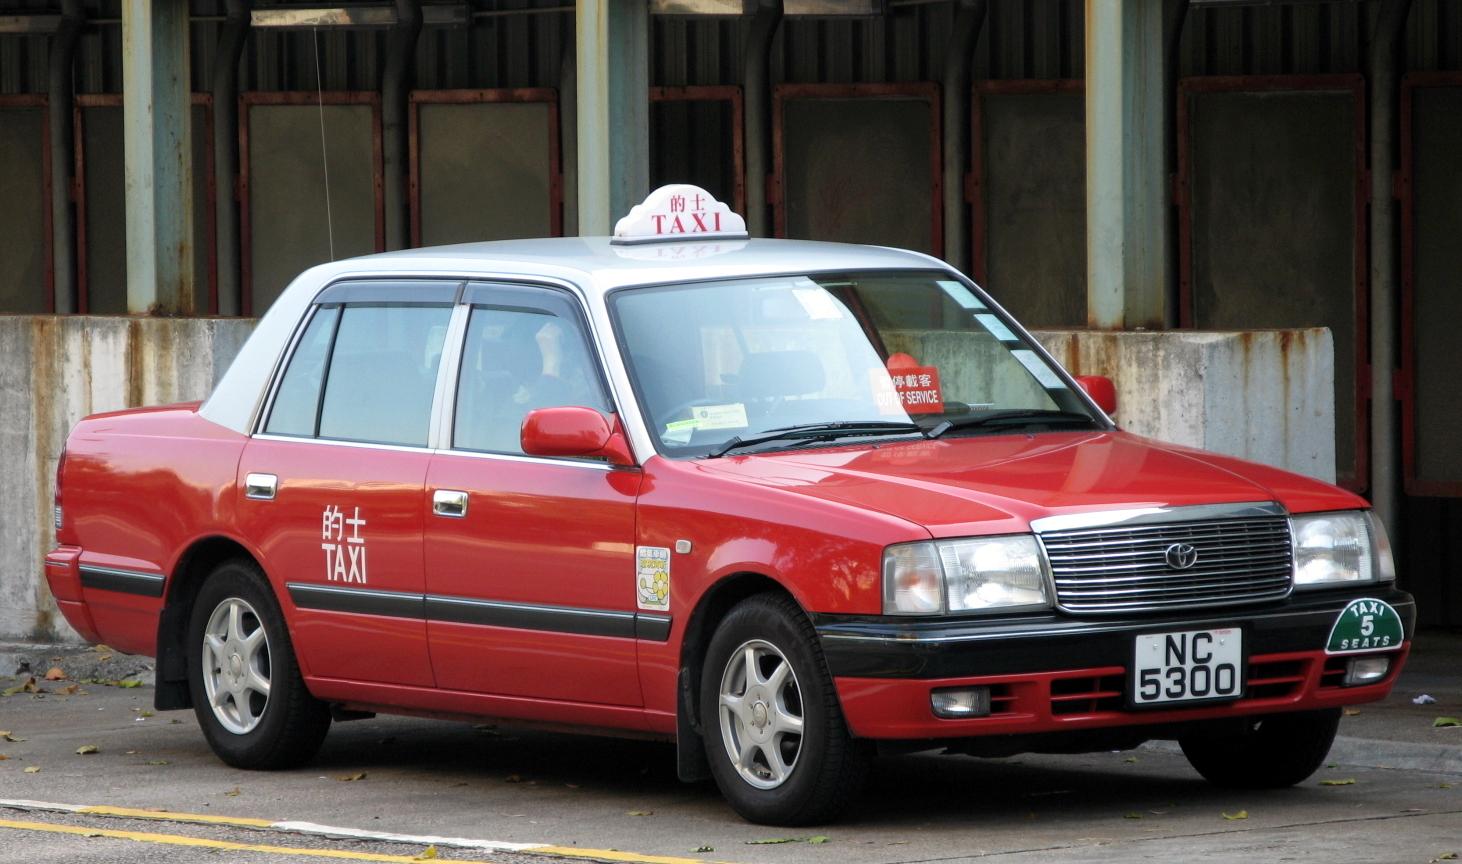 交通工具 Tanhouang